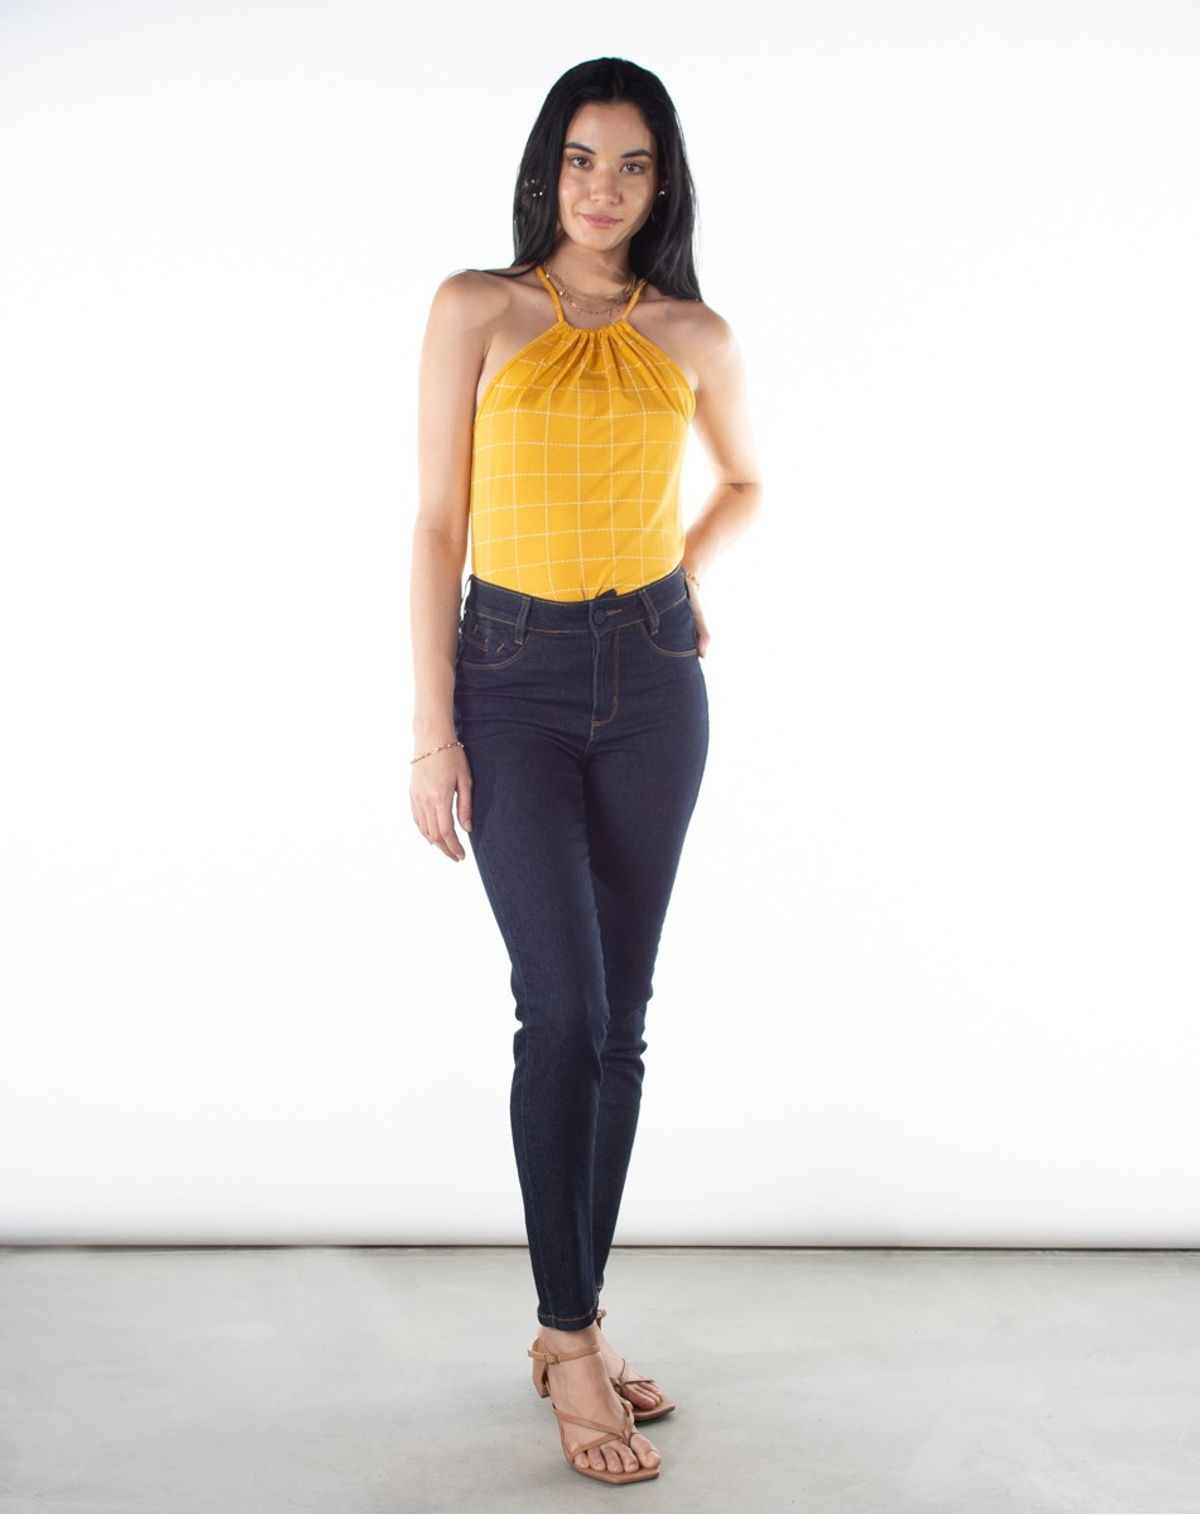 130060185001-Calca-Jeans-Cropped-Feminina-JEANS-ESCURO-36-1